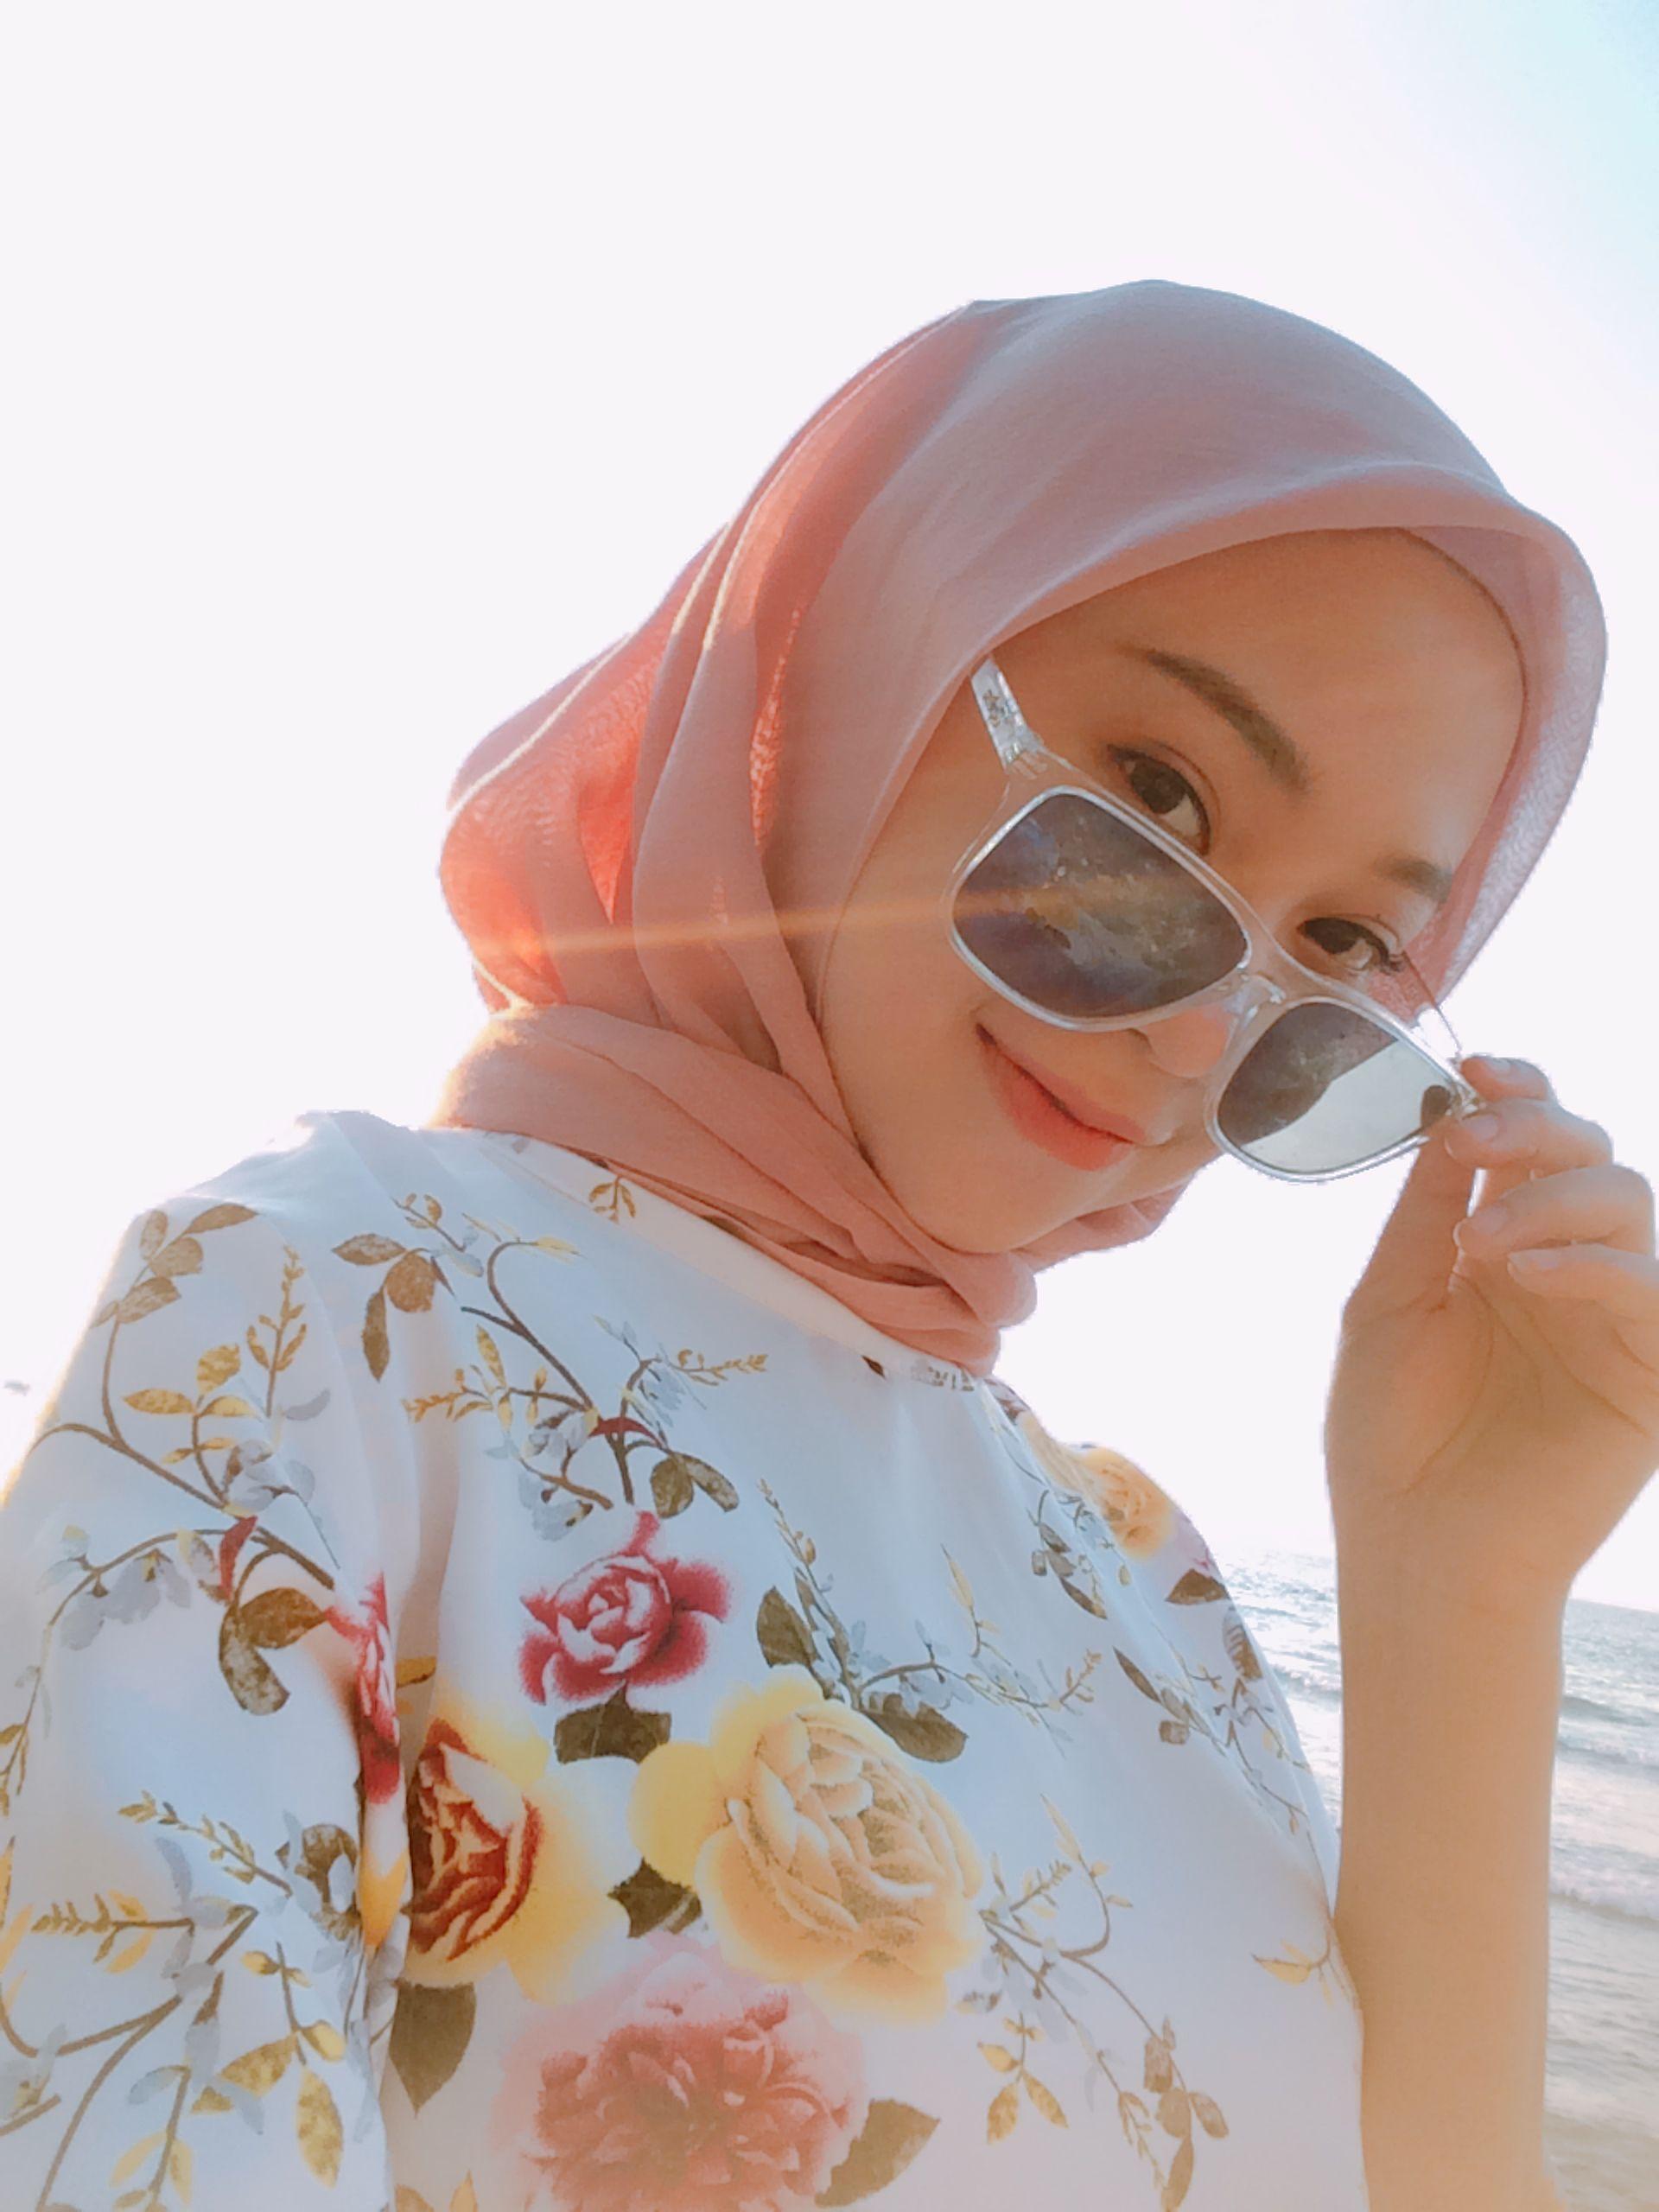 Pin oleh Dini Hadhinati di Beach, girl, hijab, muslim